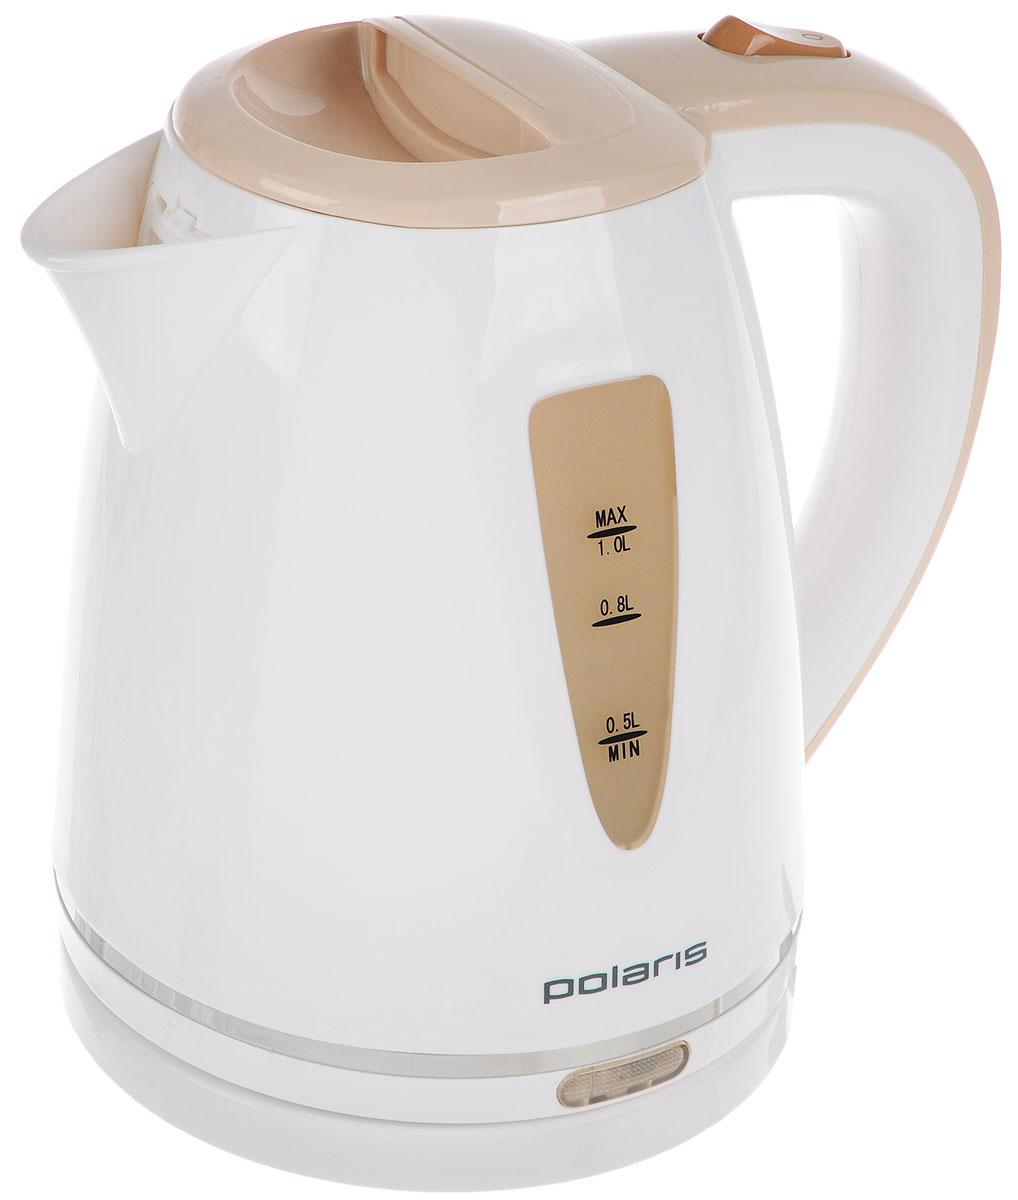 Polaris PWK 1038C, White Beige электрический чайник